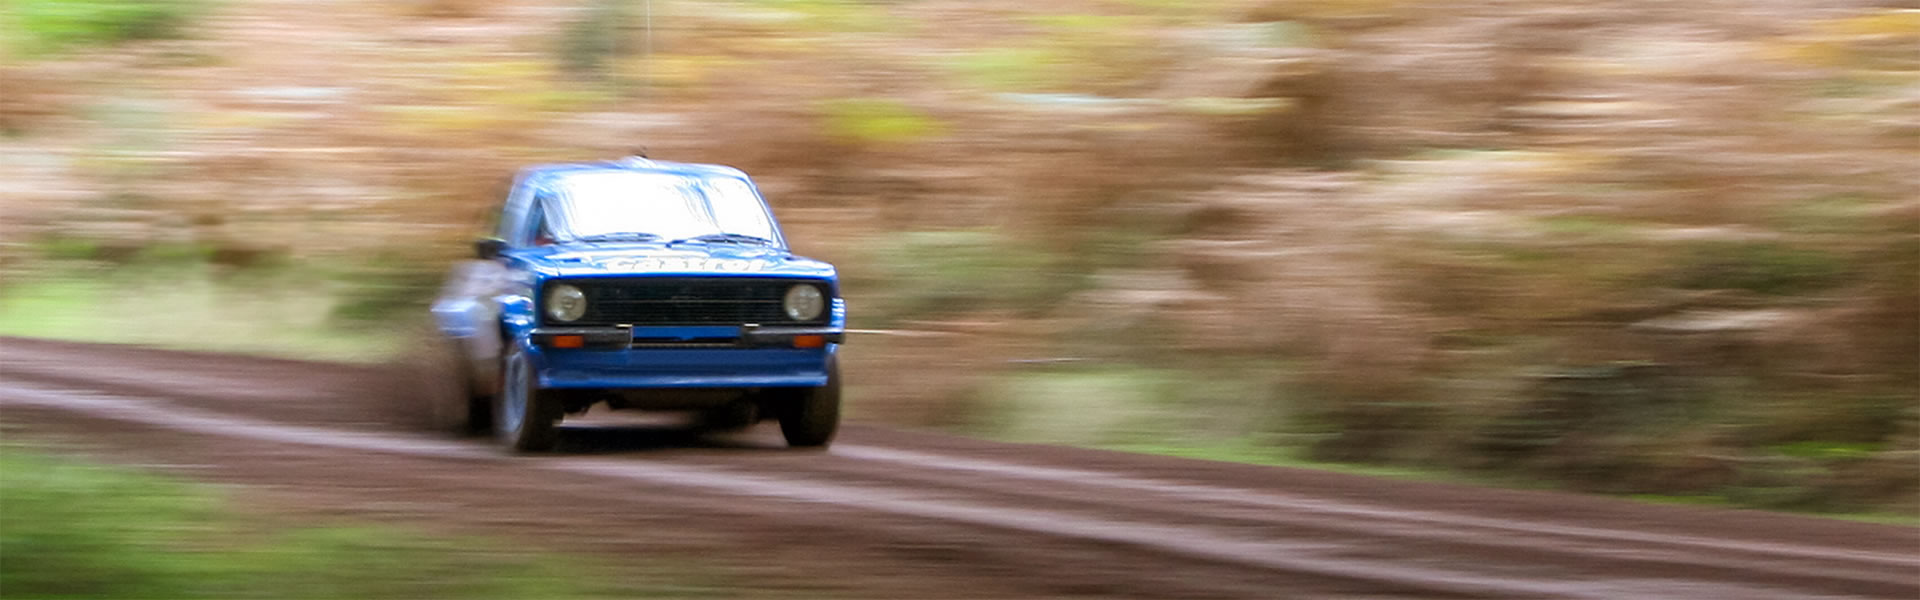 Rally car in full speed